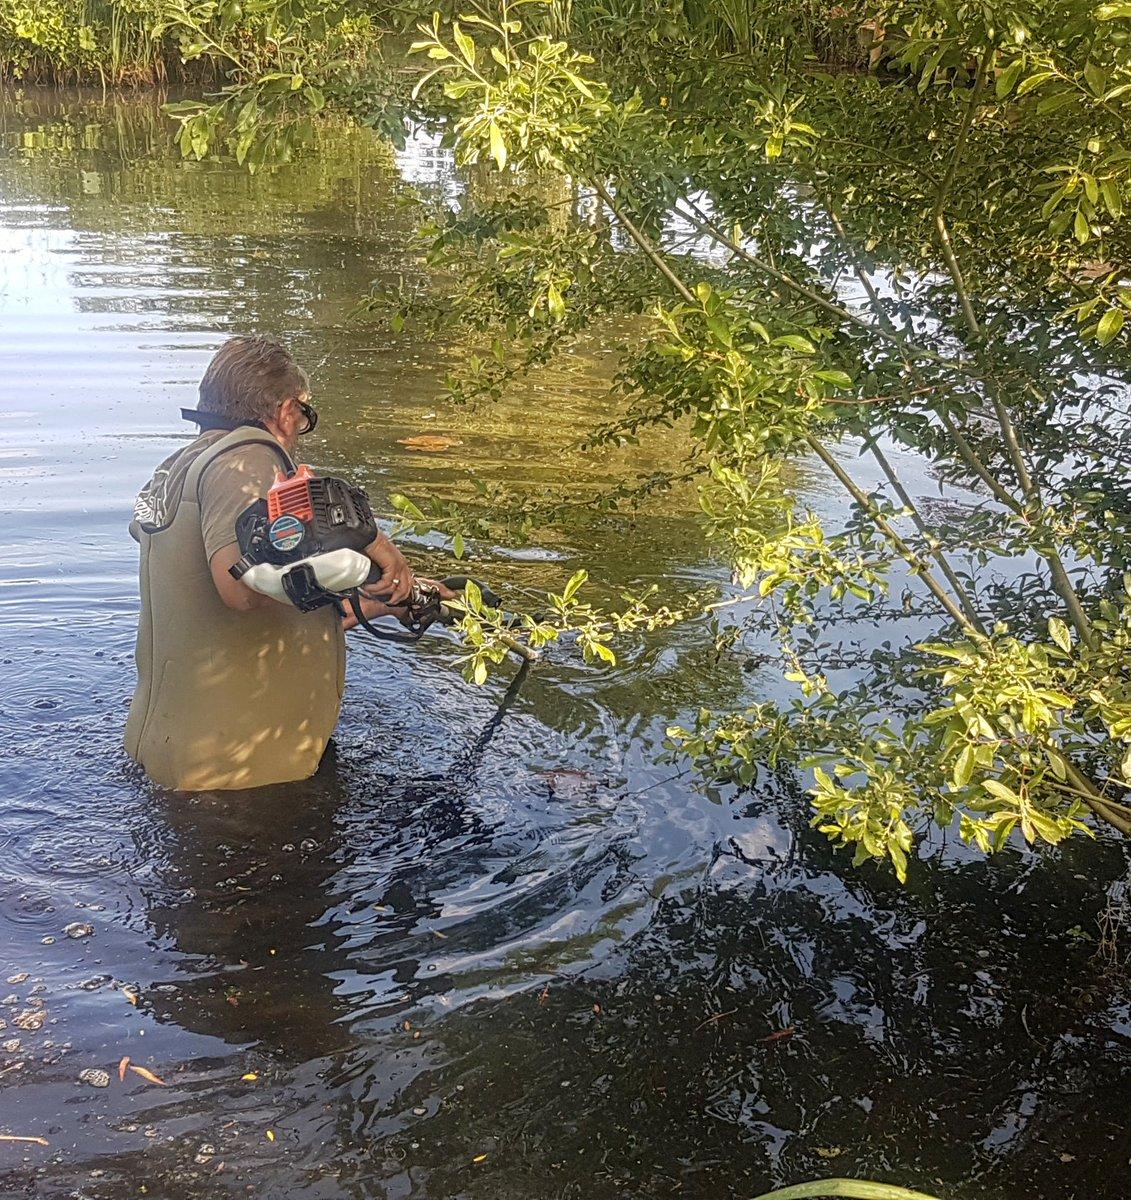 Weed clearance underway on the Road Lake... #RumBridgeFisheries #CarpFishing #Holidays #Suffolk #Car